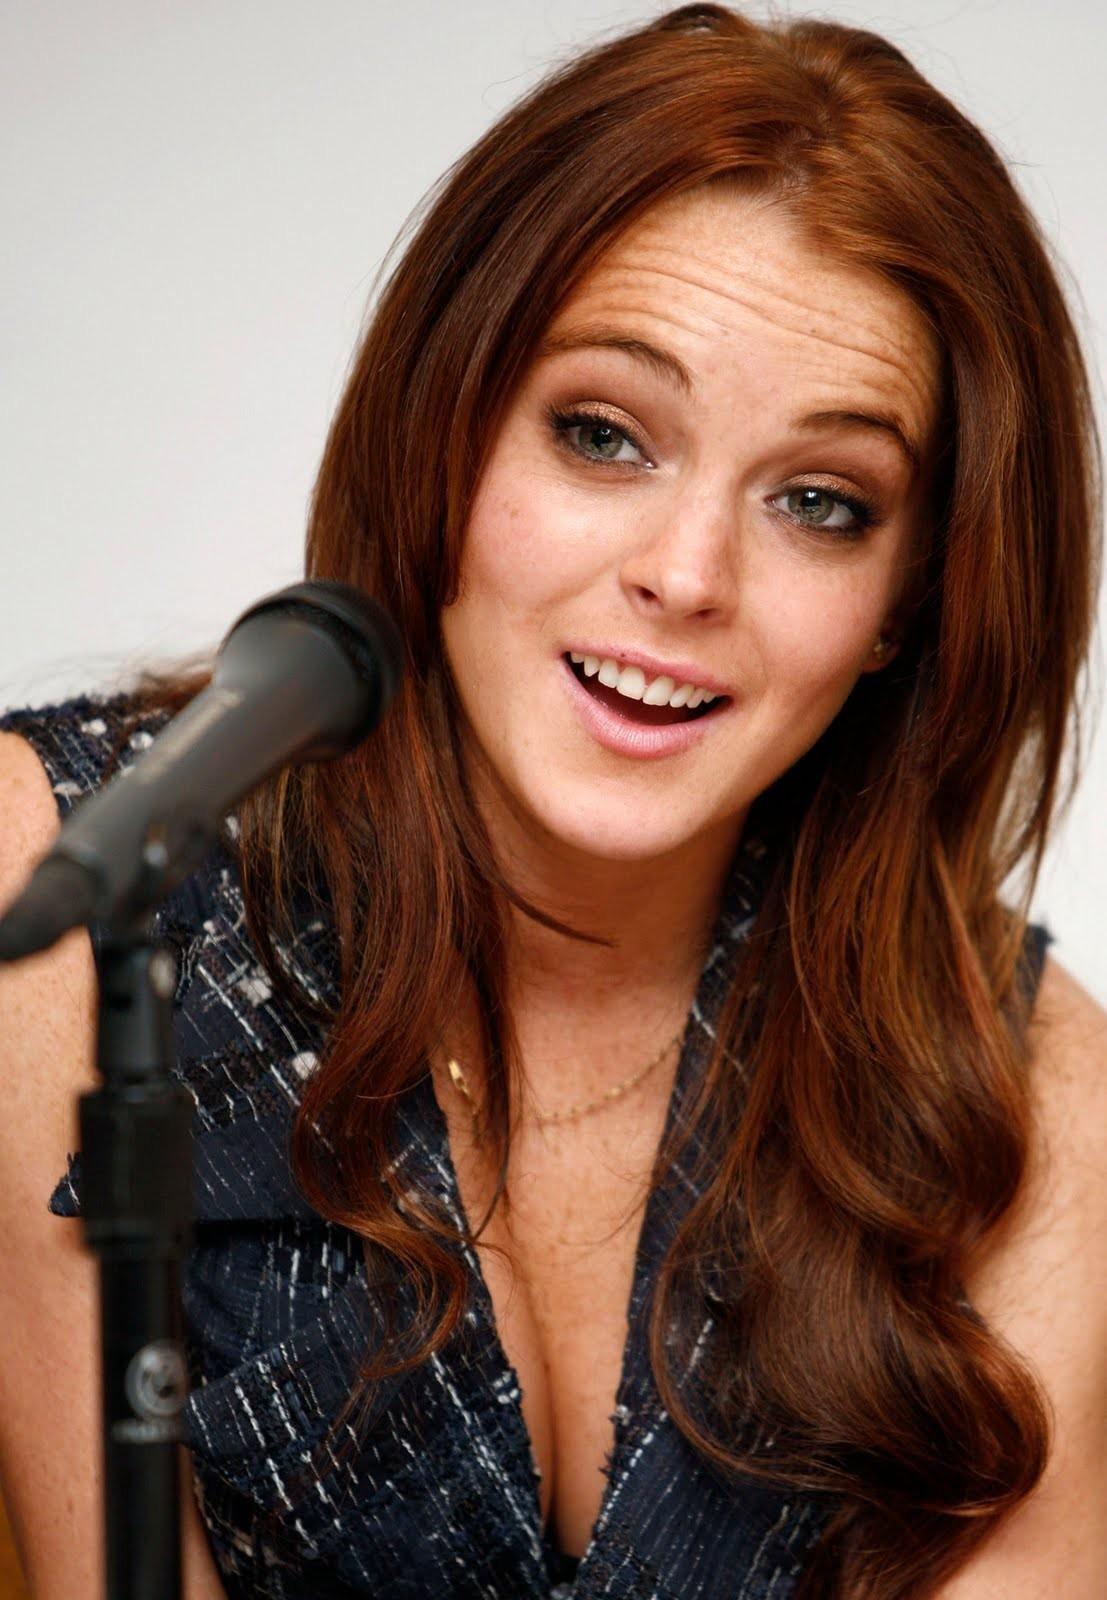 Lindsay Lohan Just My Luck Jpeg Red Hair 2006496385g 11071600